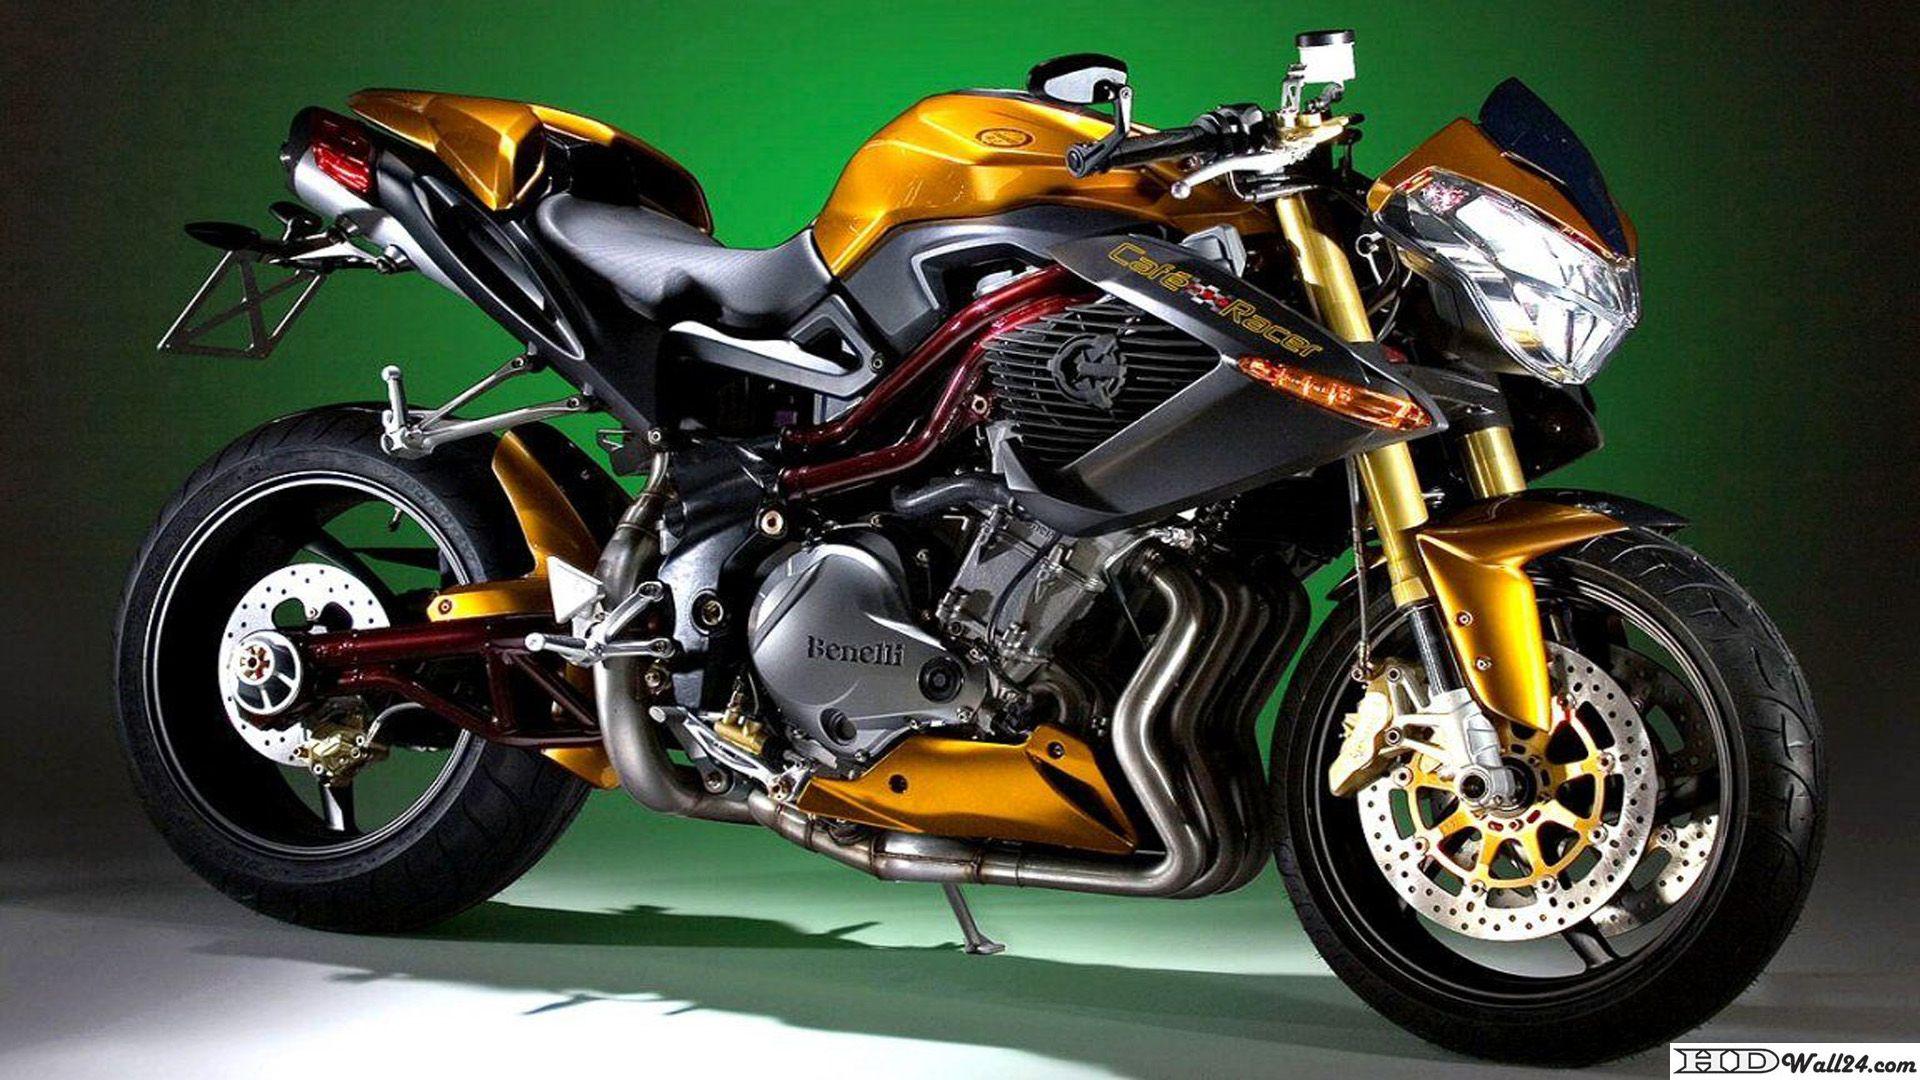 benelli motor bike wallpapers | free hd wallpaper download | http